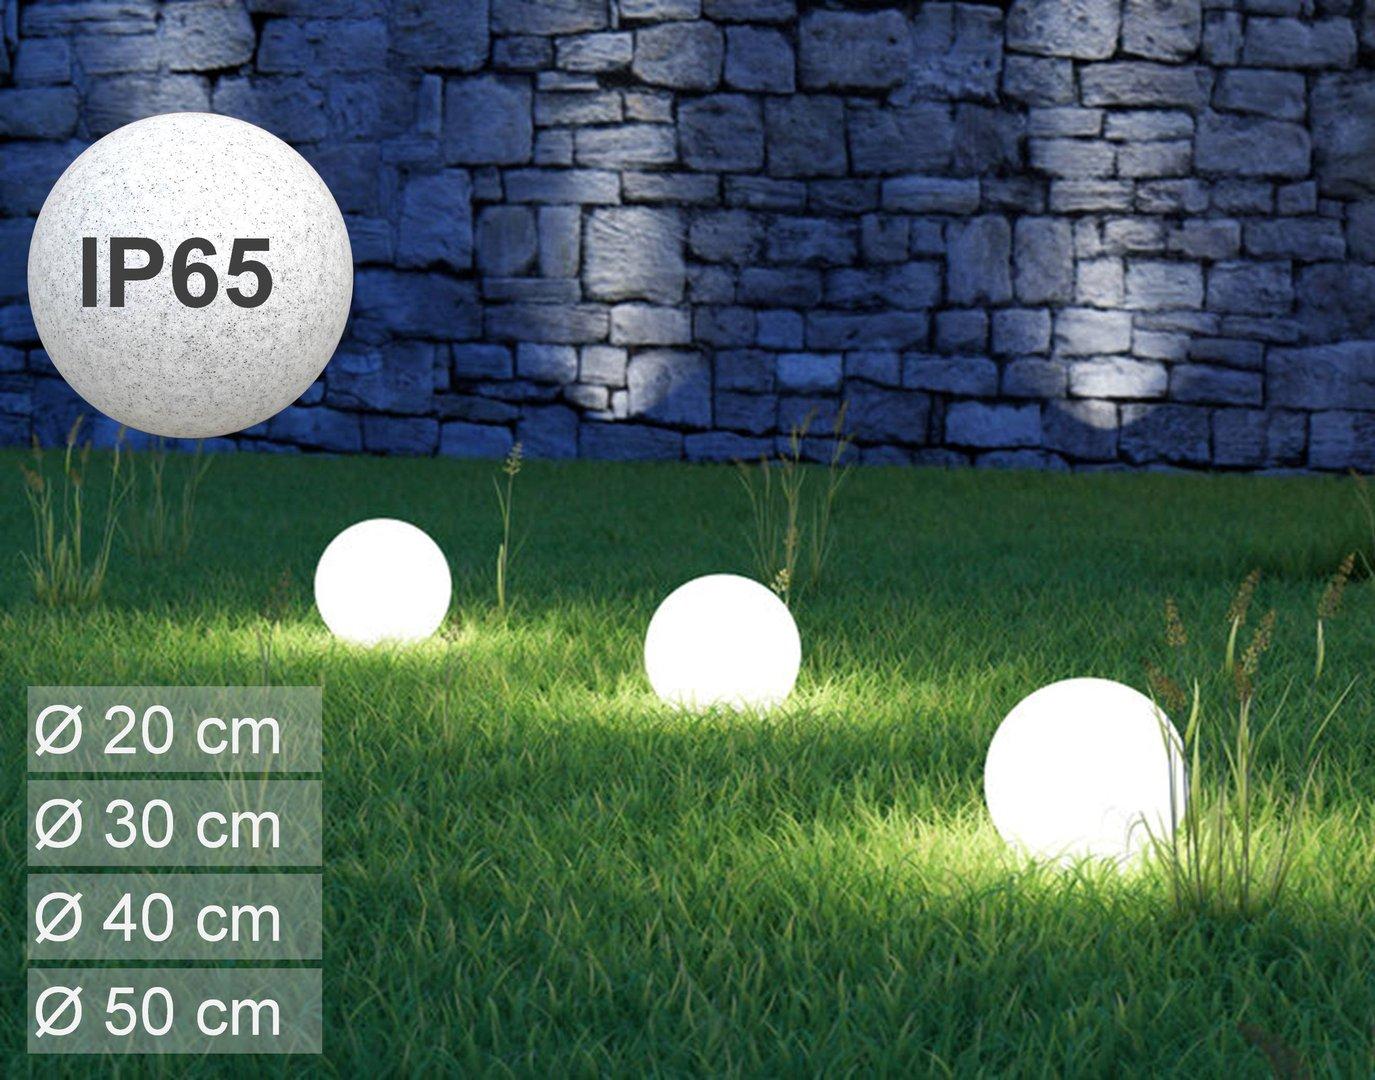 Full Size of Leuchtkugel Garten Globe Ip65 230v Aufbauleuchte In 4 Gren Ww Whirlpool Aufblasbar Sauna Pavillon Sichtschutz Led Spot Trennwand Pergola Kinderspielturm Garten Leuchtkugel Garten